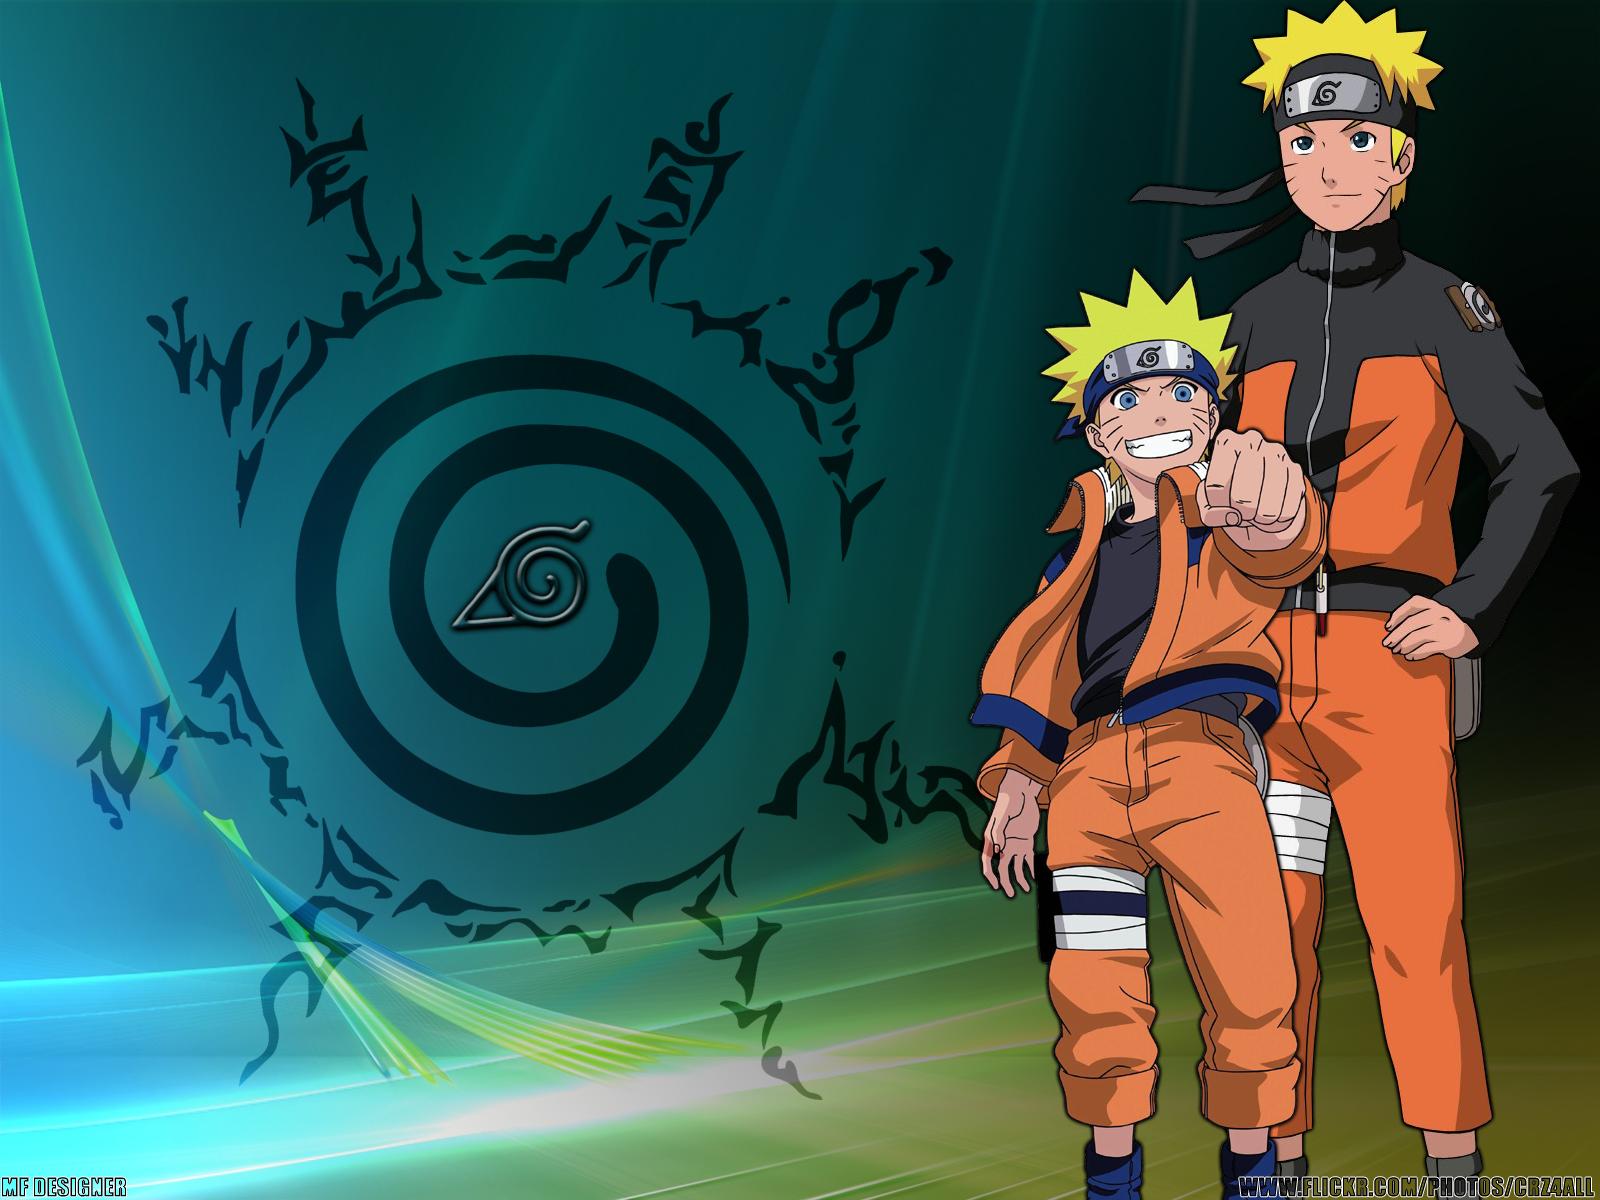 Wallpaper Hd Naruto Shippuden 3d Imagenes De Naruto En Hd Para Whatsapp Fondos